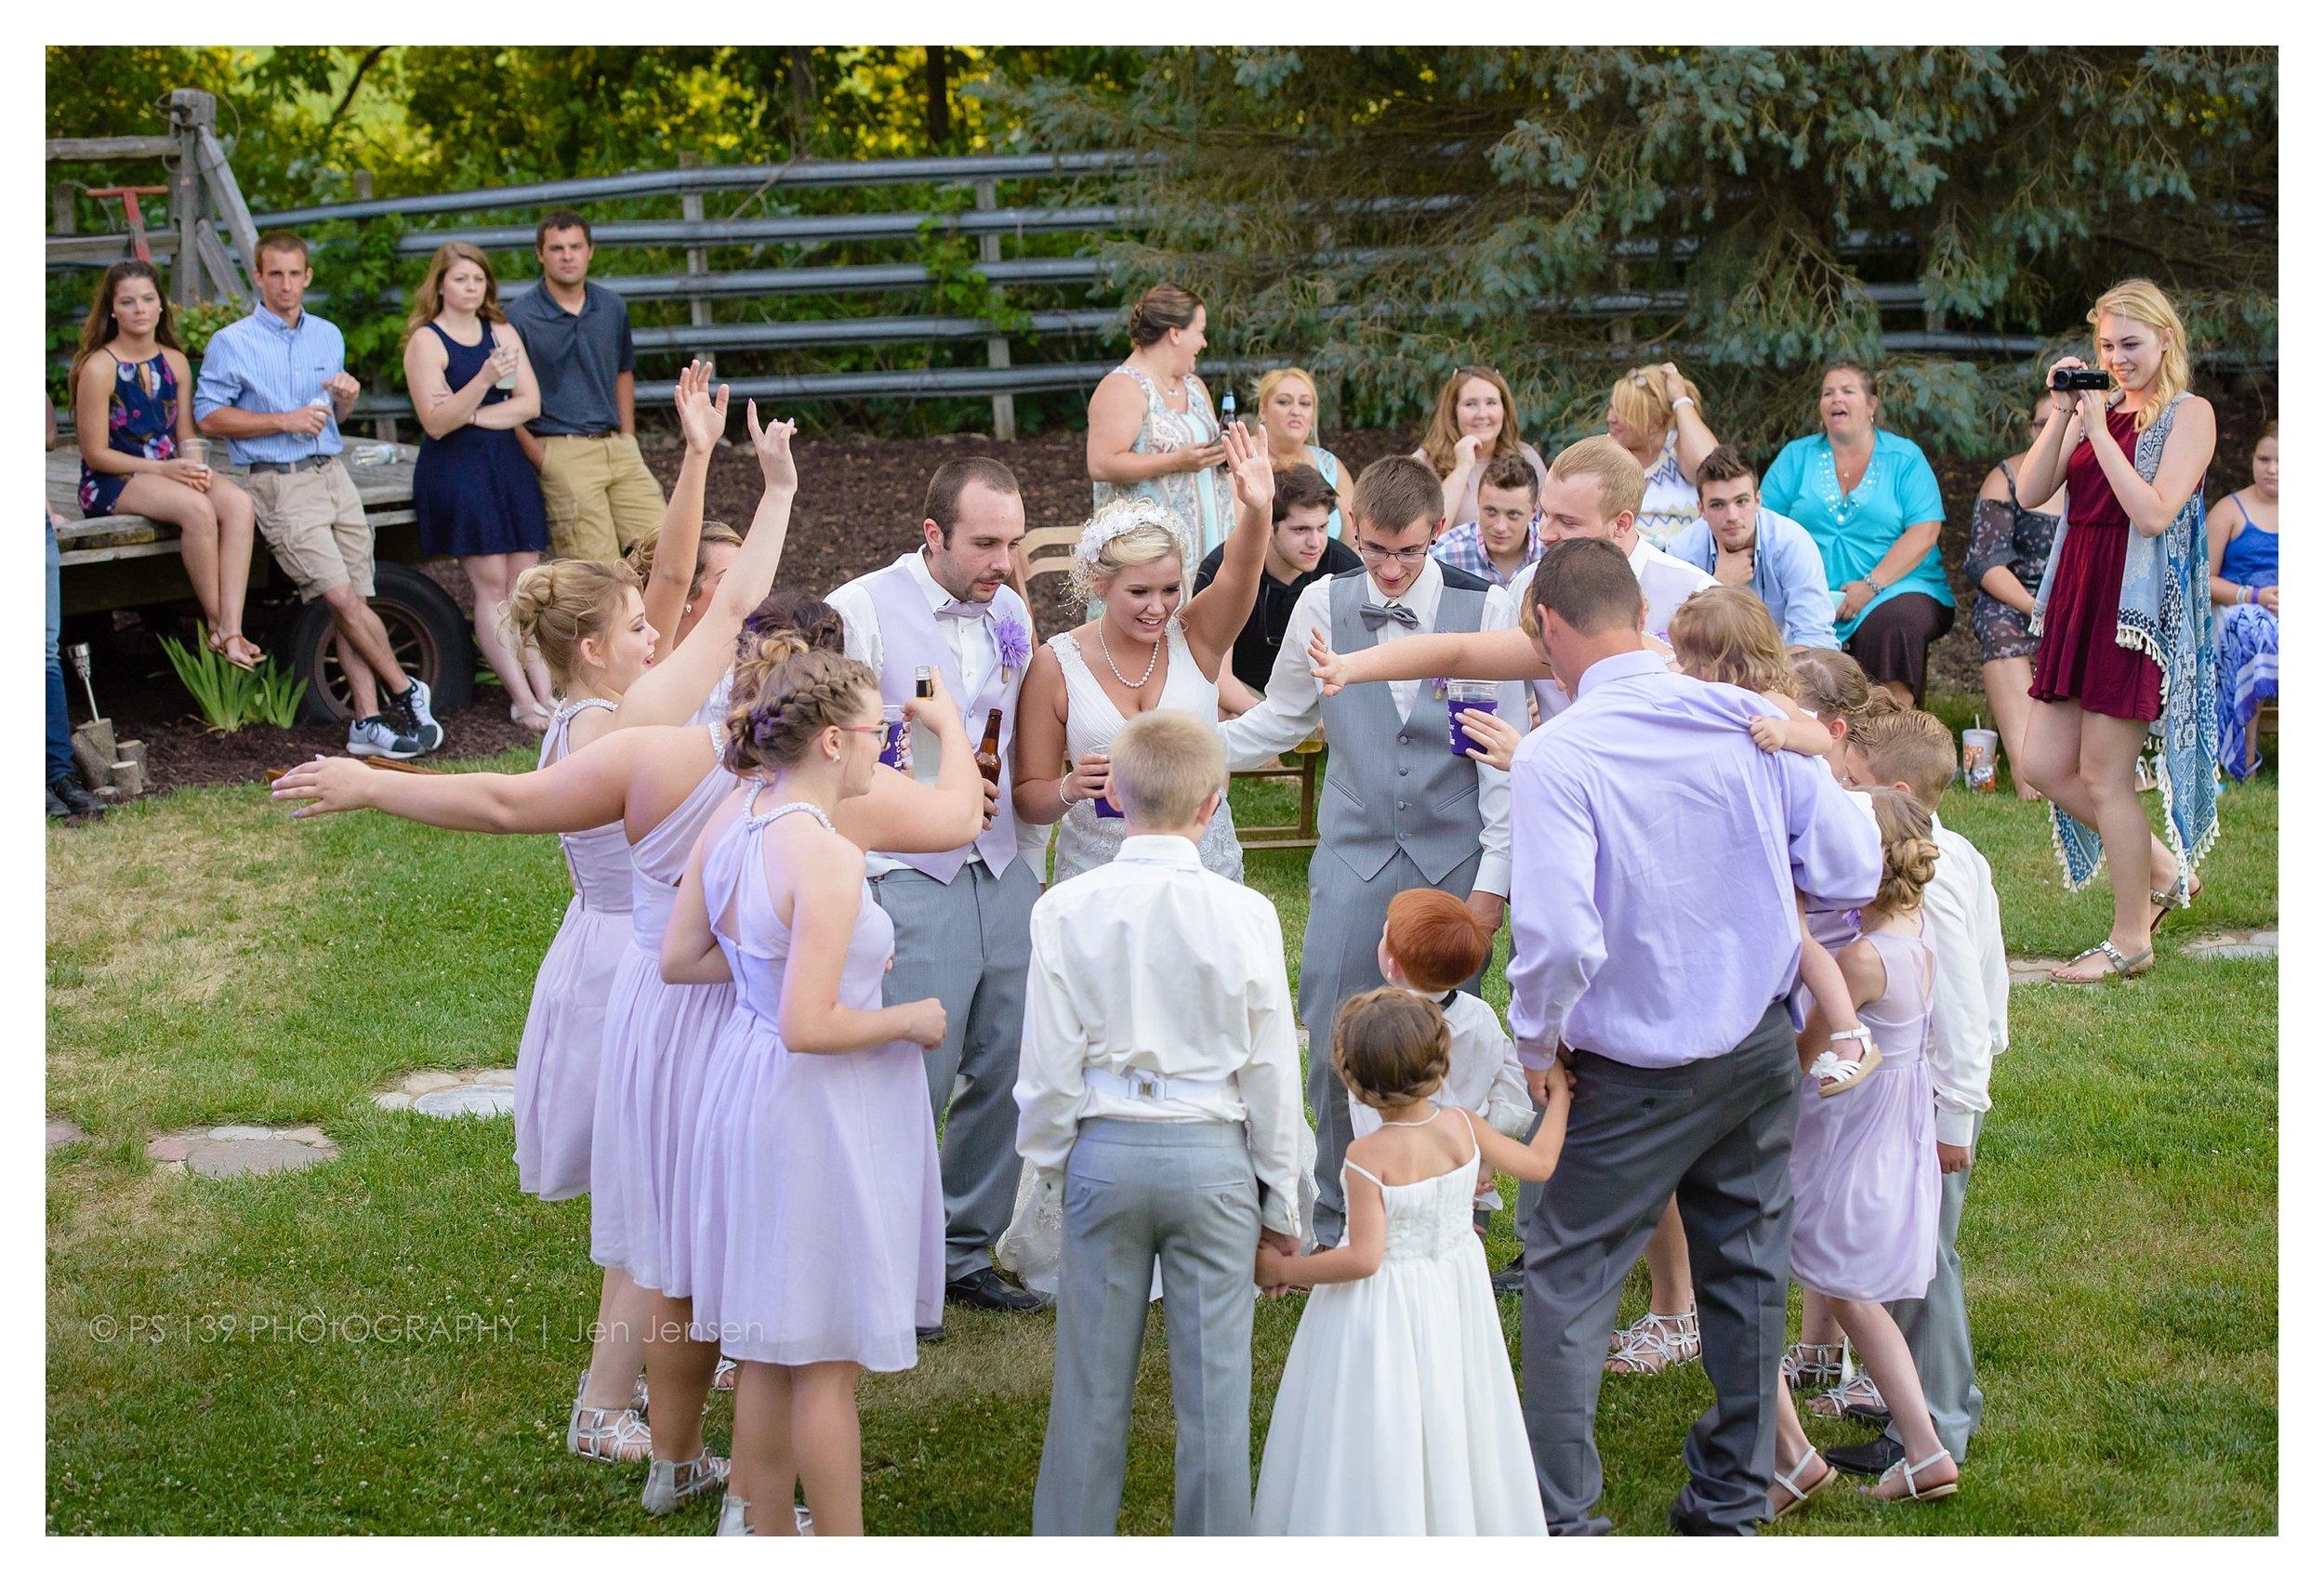 oregon Illinois oak lane farm wisconsin wedding photographer bayfield wi ps 139 photography jen jensen_0251.jpg